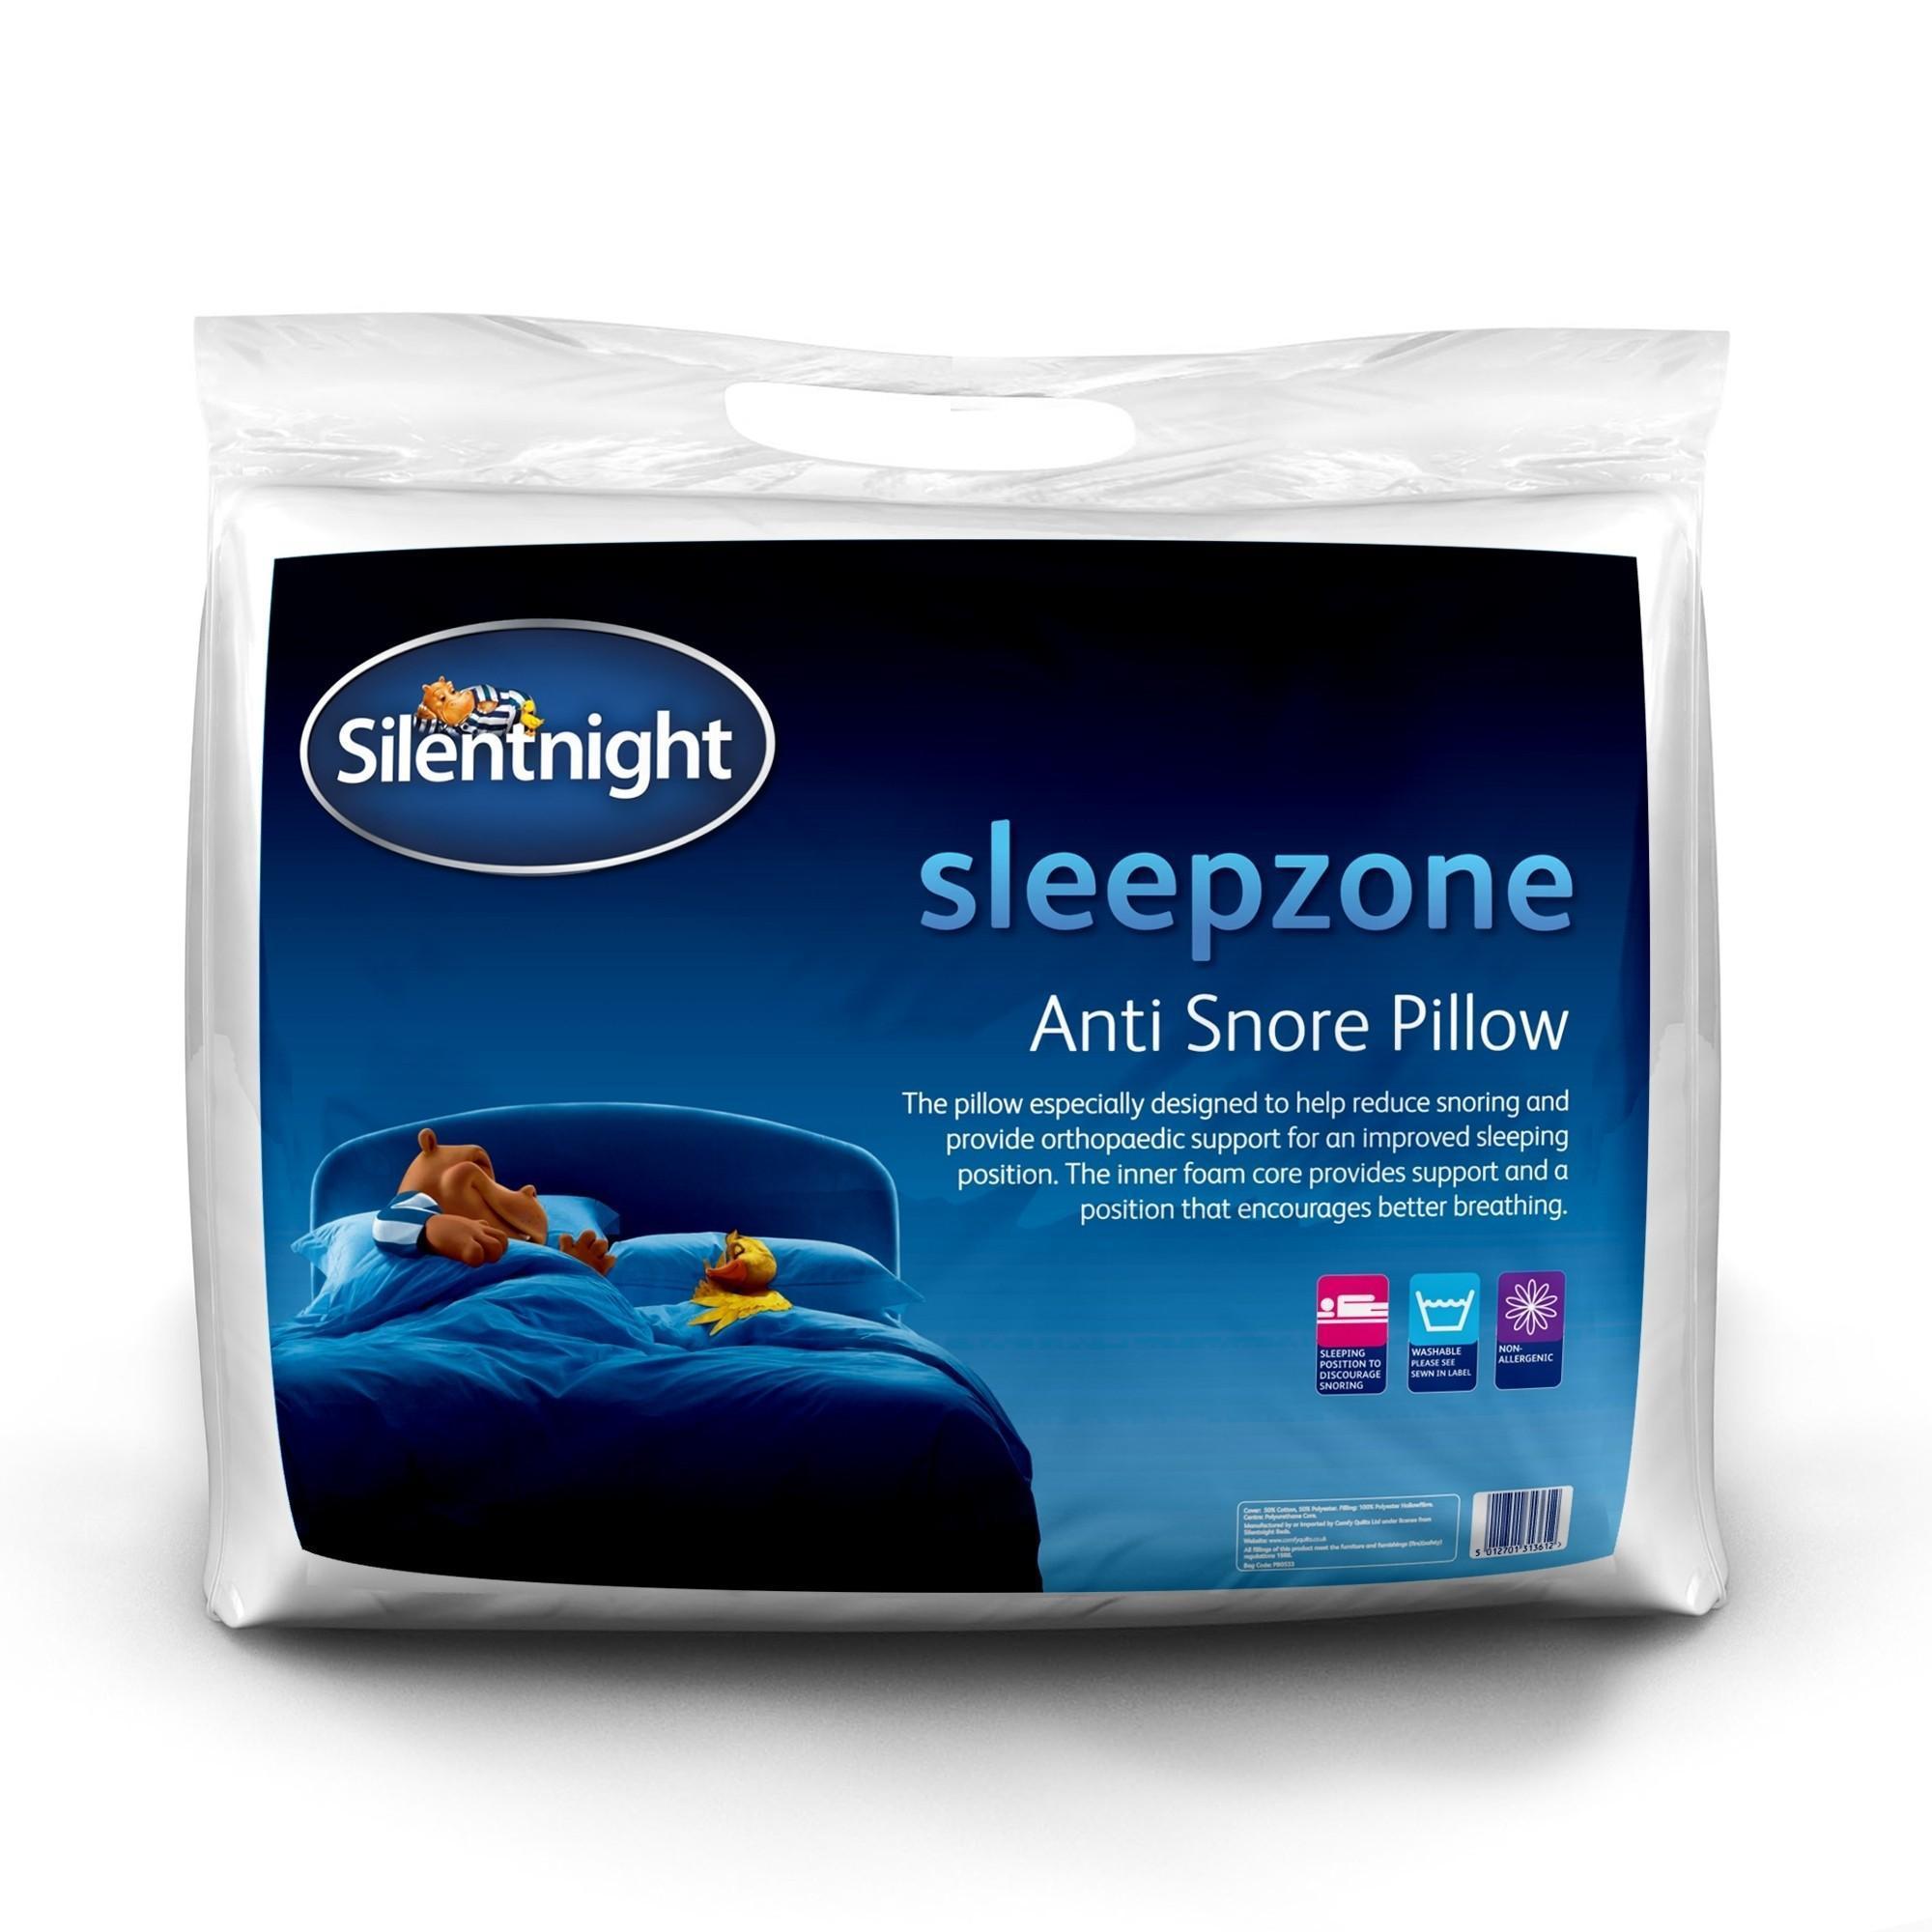 silentnight sleepzone anti snore pillow ponden home. Black Bedroom Furniture Sets. Home Design Ideas